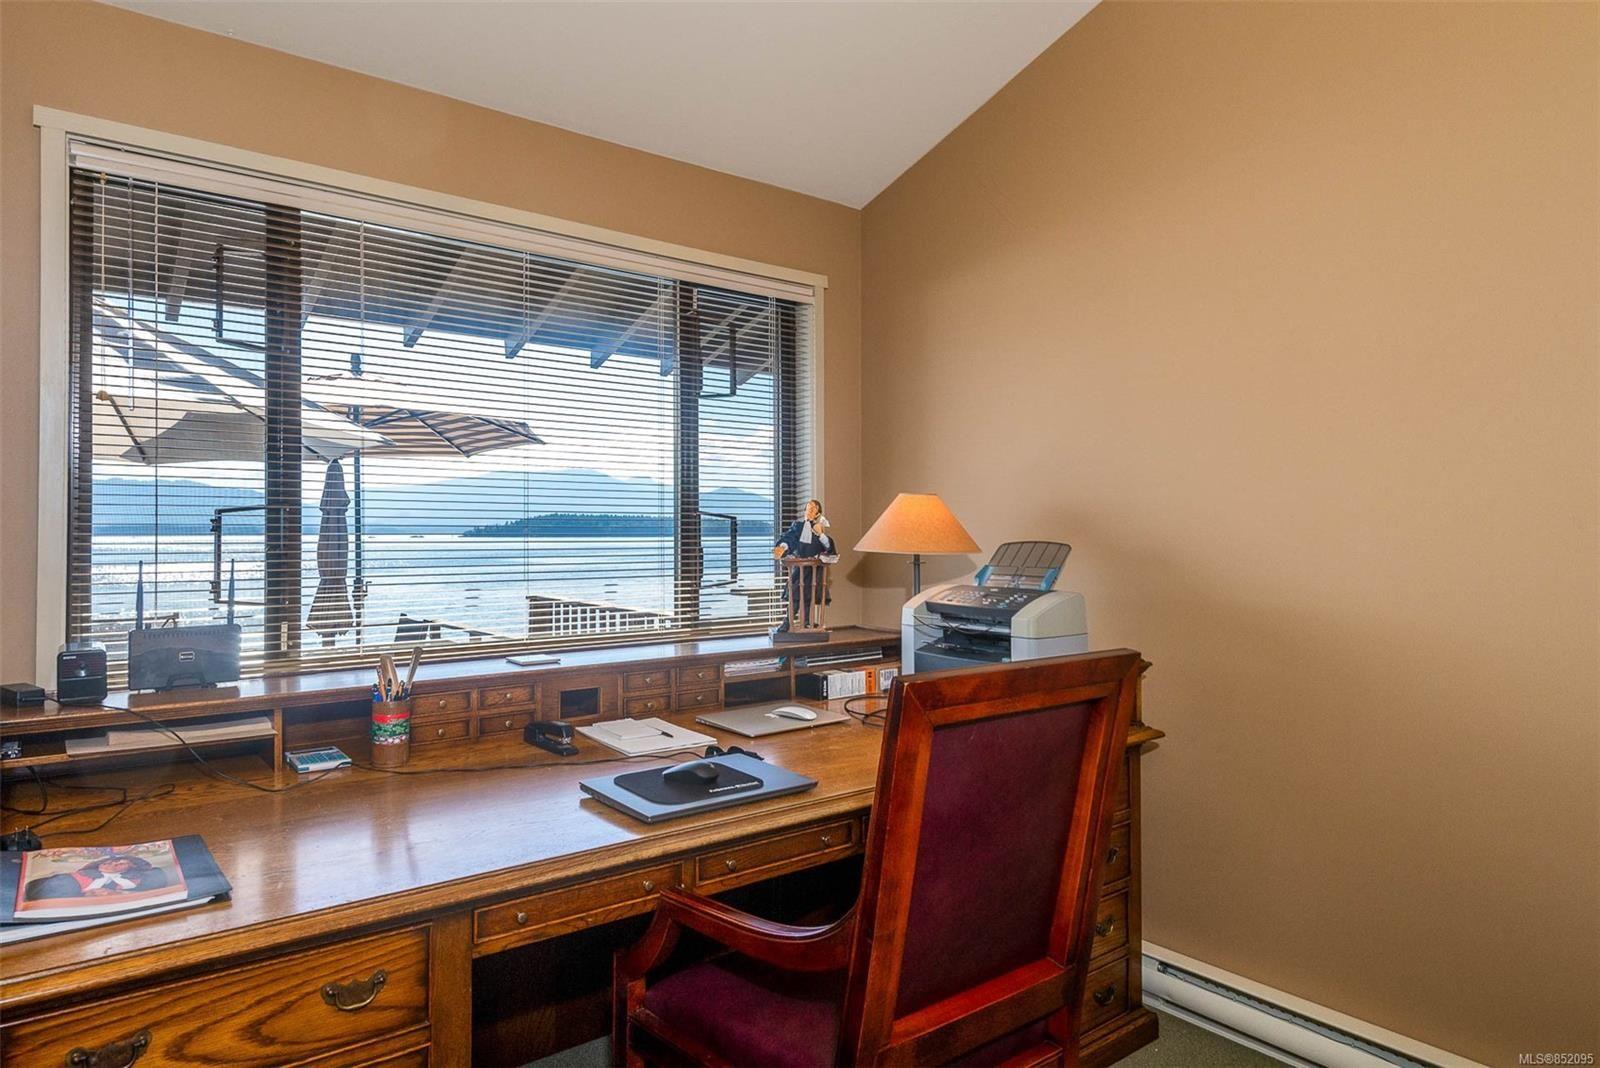 Photo 18: Photos: 236 McGill Rd in : GI Salt Spring House for sale (Gulf Islands)  : MLS®# 852095